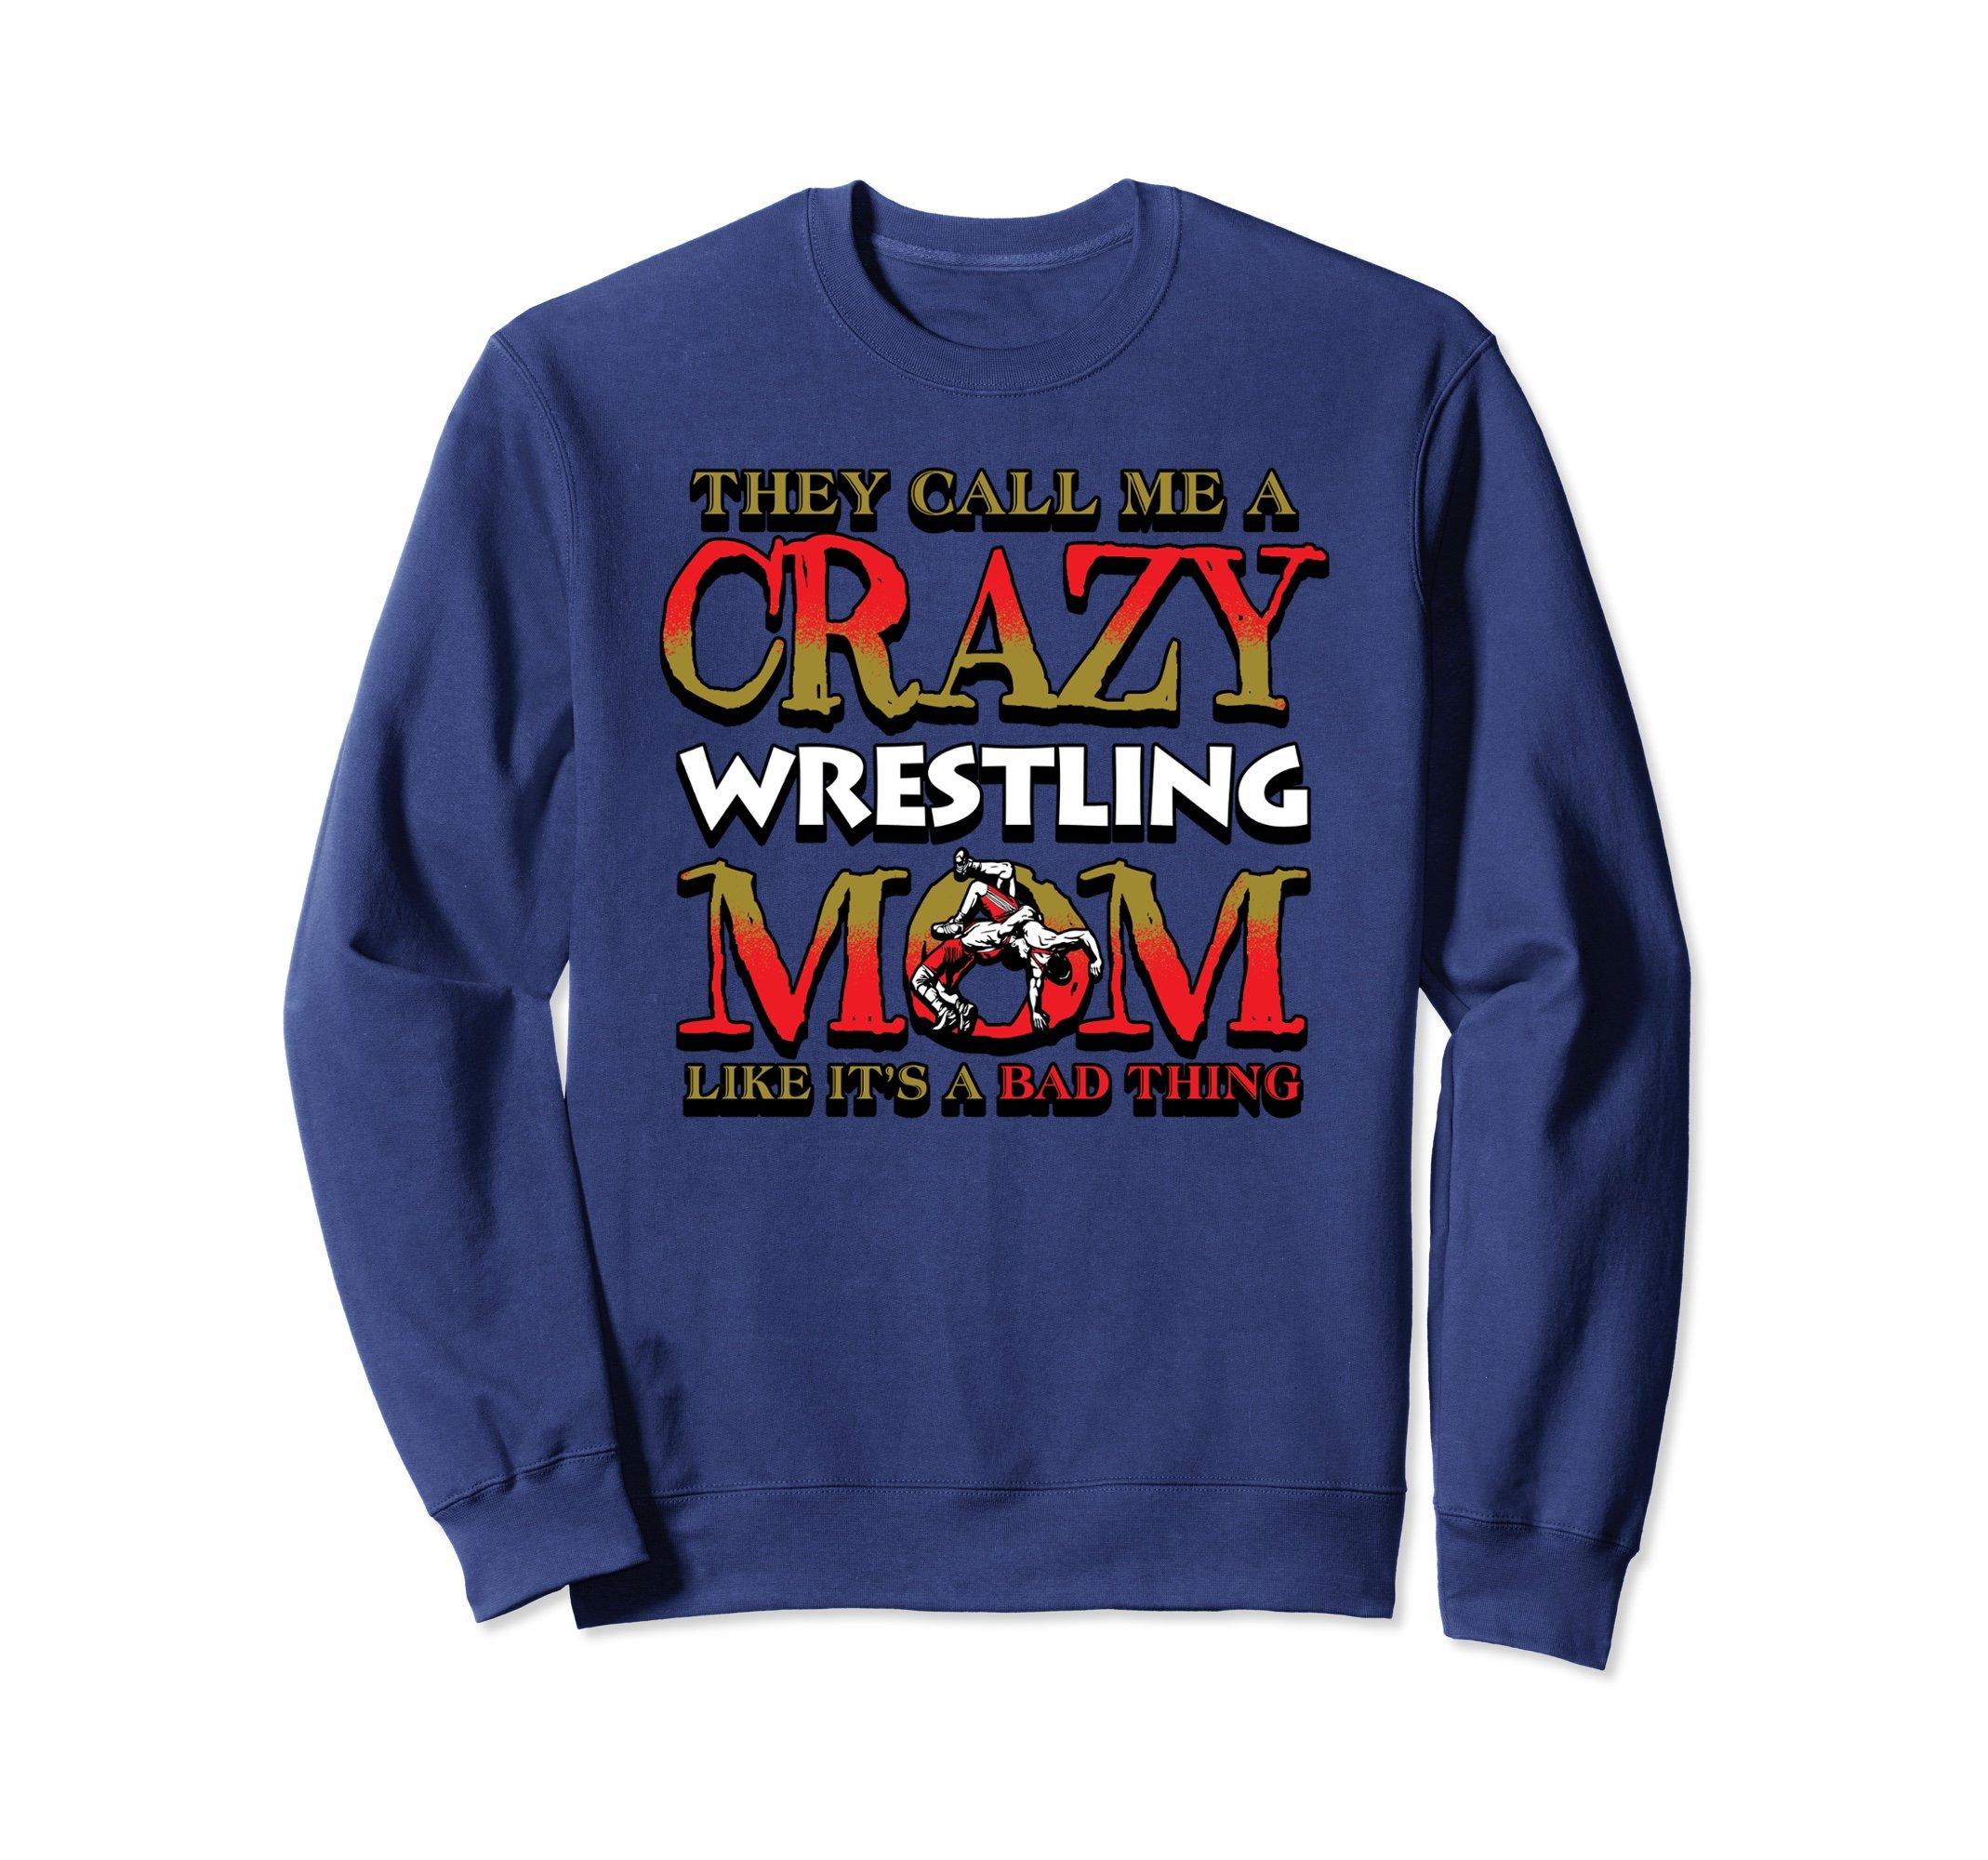 Unisex Wrestling Sweatshirt -Crazy wrestling Mom Sweater Small Navy